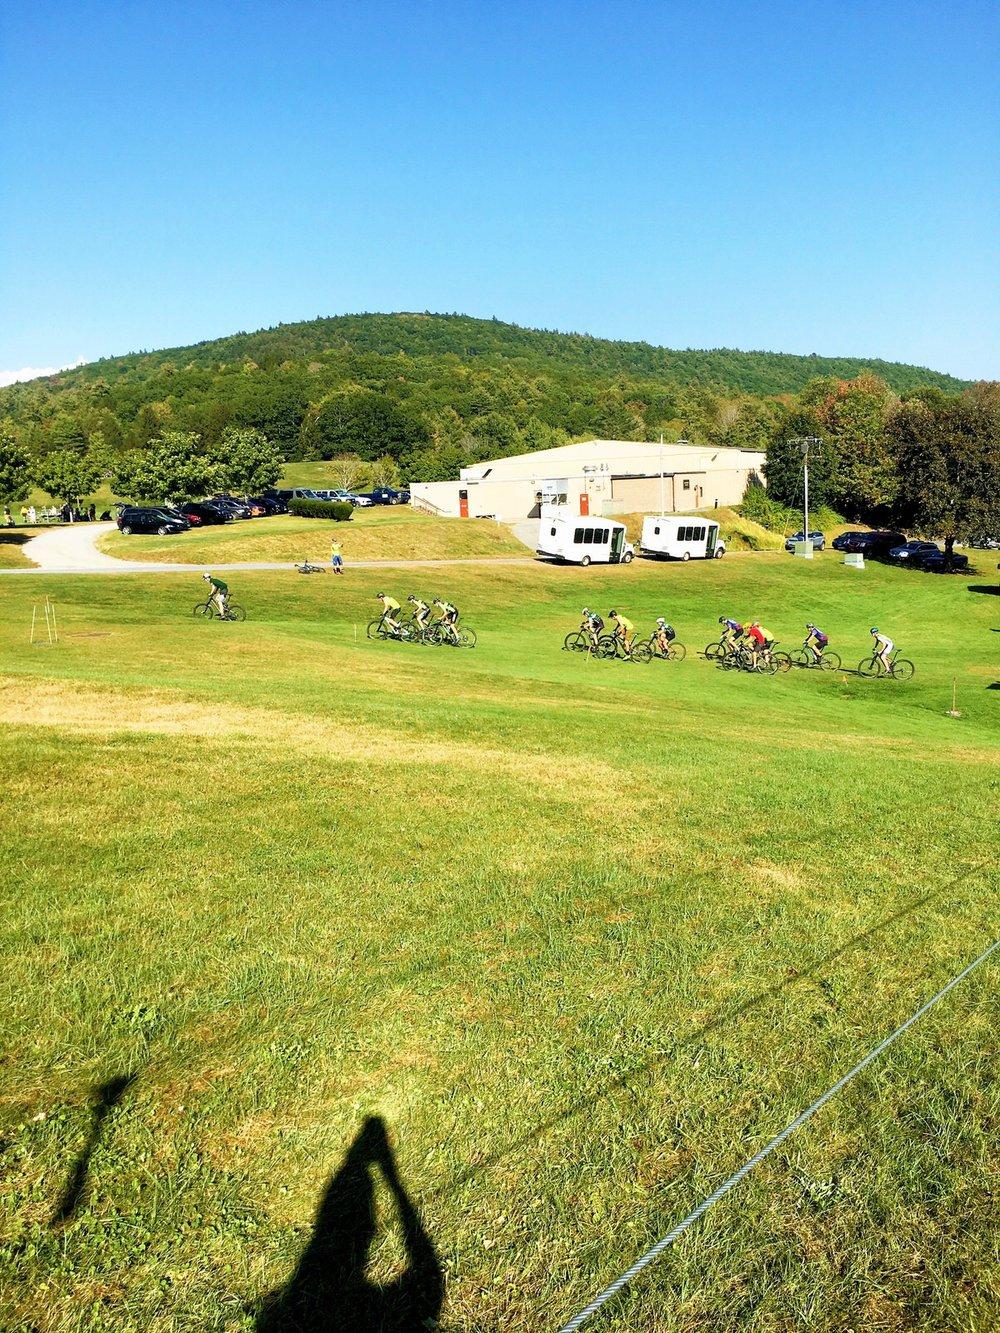 Mountain Biking at Vermont Academy - September 27, 2017  - 7927.JPG